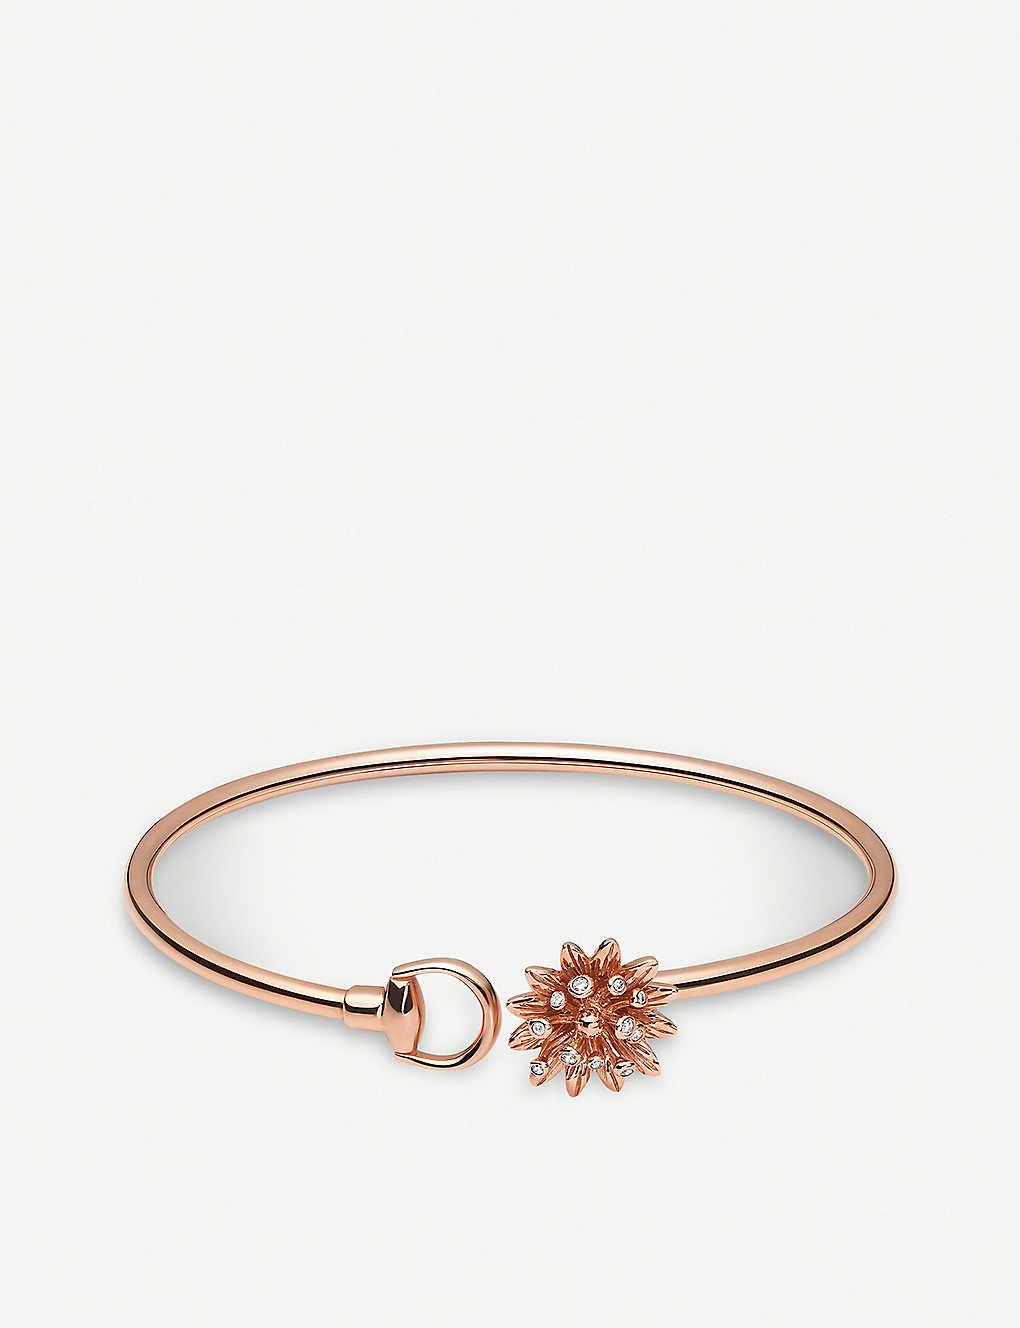 52cb381ac83cd Flora 18ct rose gold bracelet